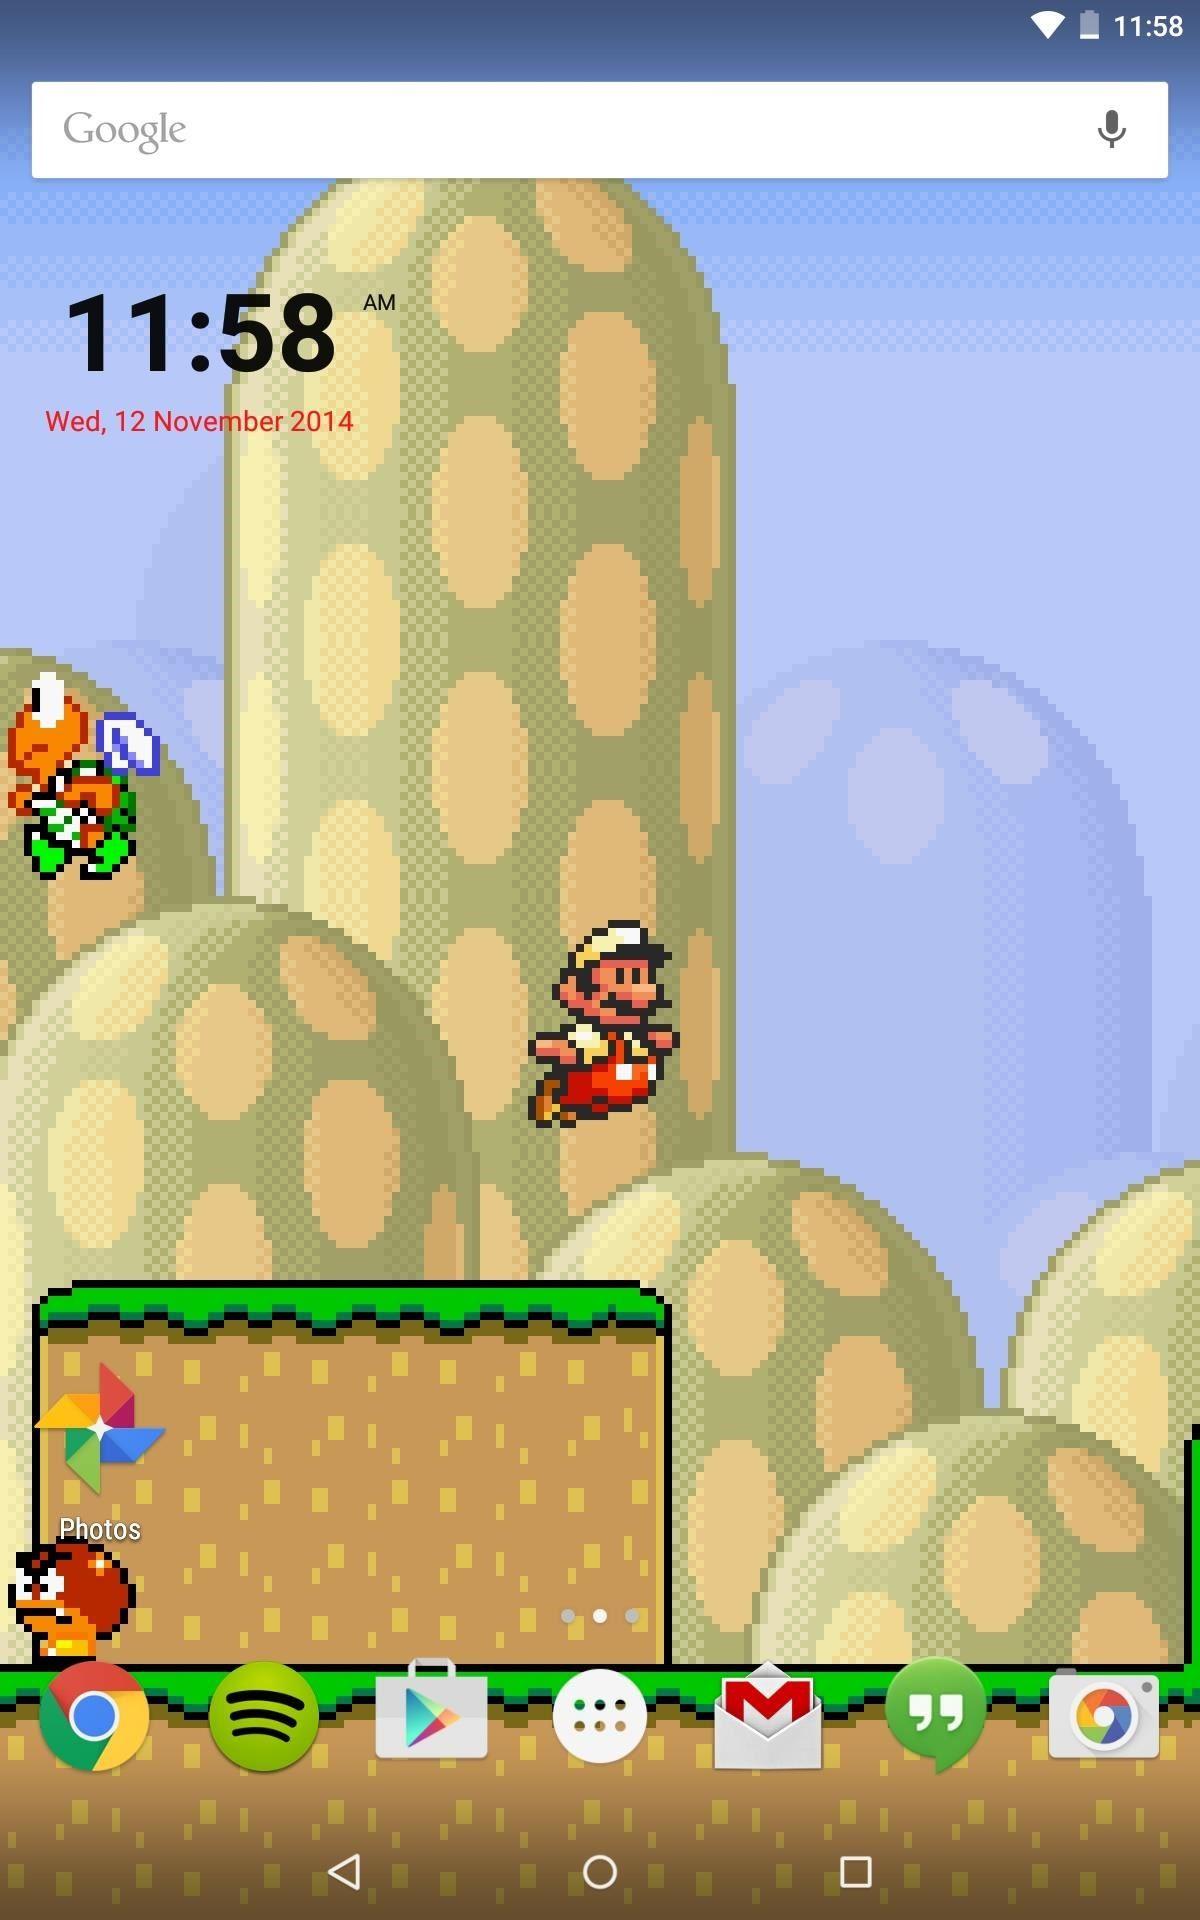 Mario Live Wallpaper Iphone 1728603 Hd Wallpaper Backgrounds Download